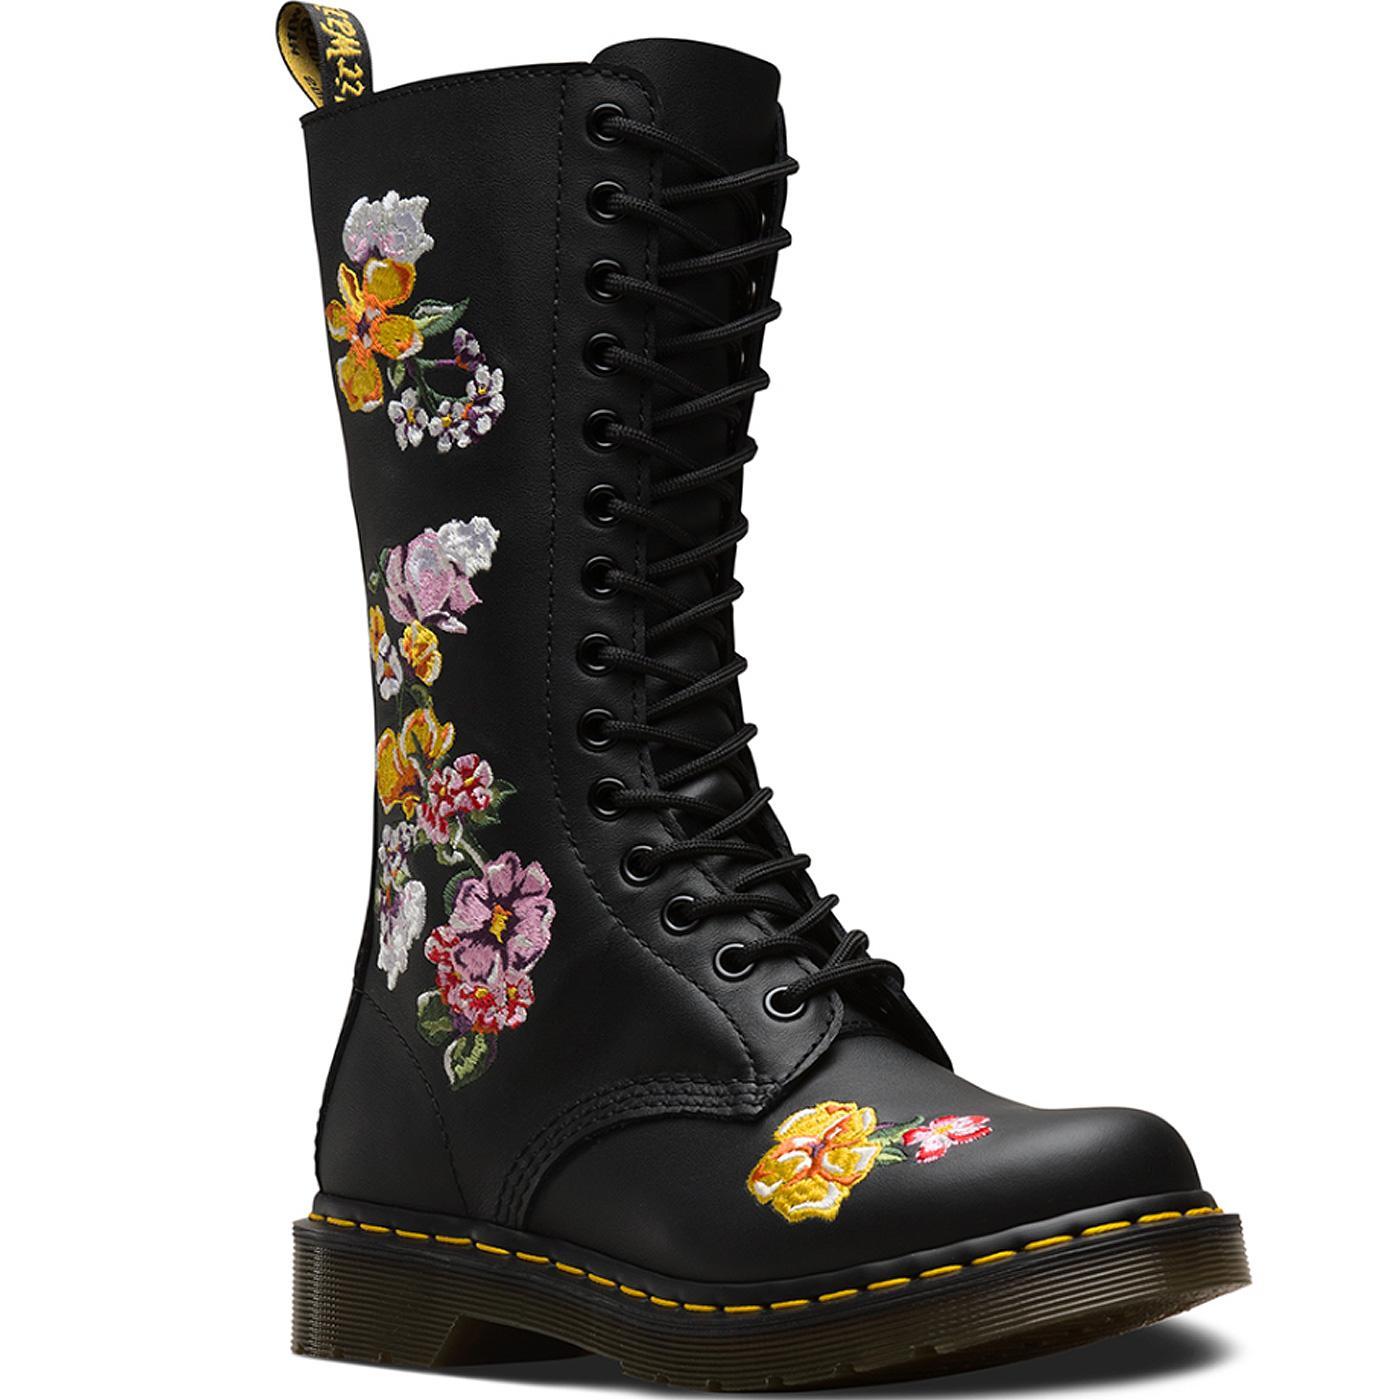 1914 Vonda II DR MARTENS Floral Knee High Boots